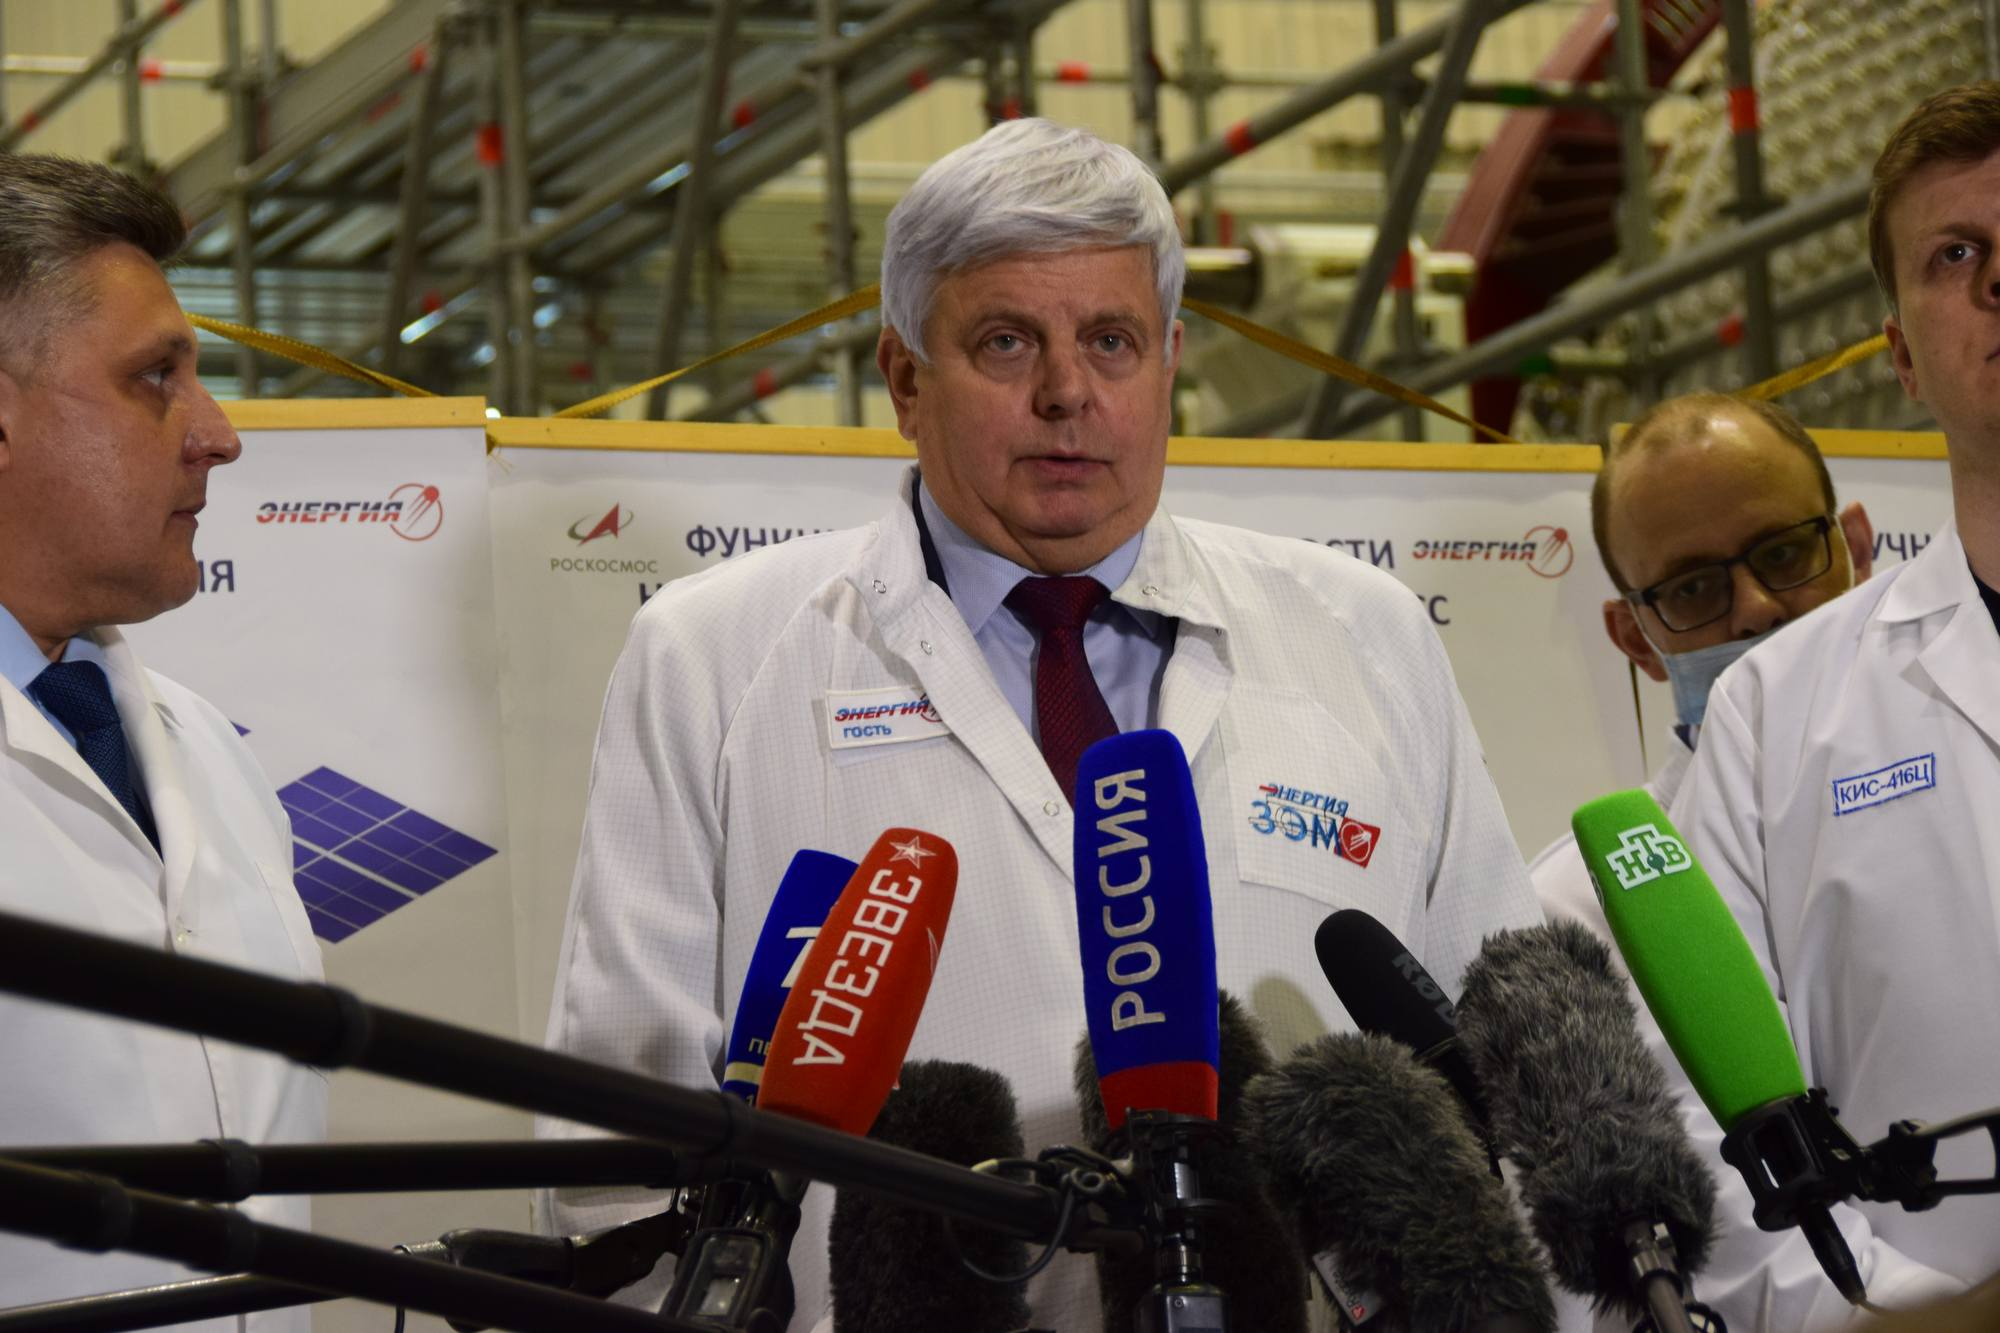 Vladimir Solovyov s'exprime devant les journalistes.